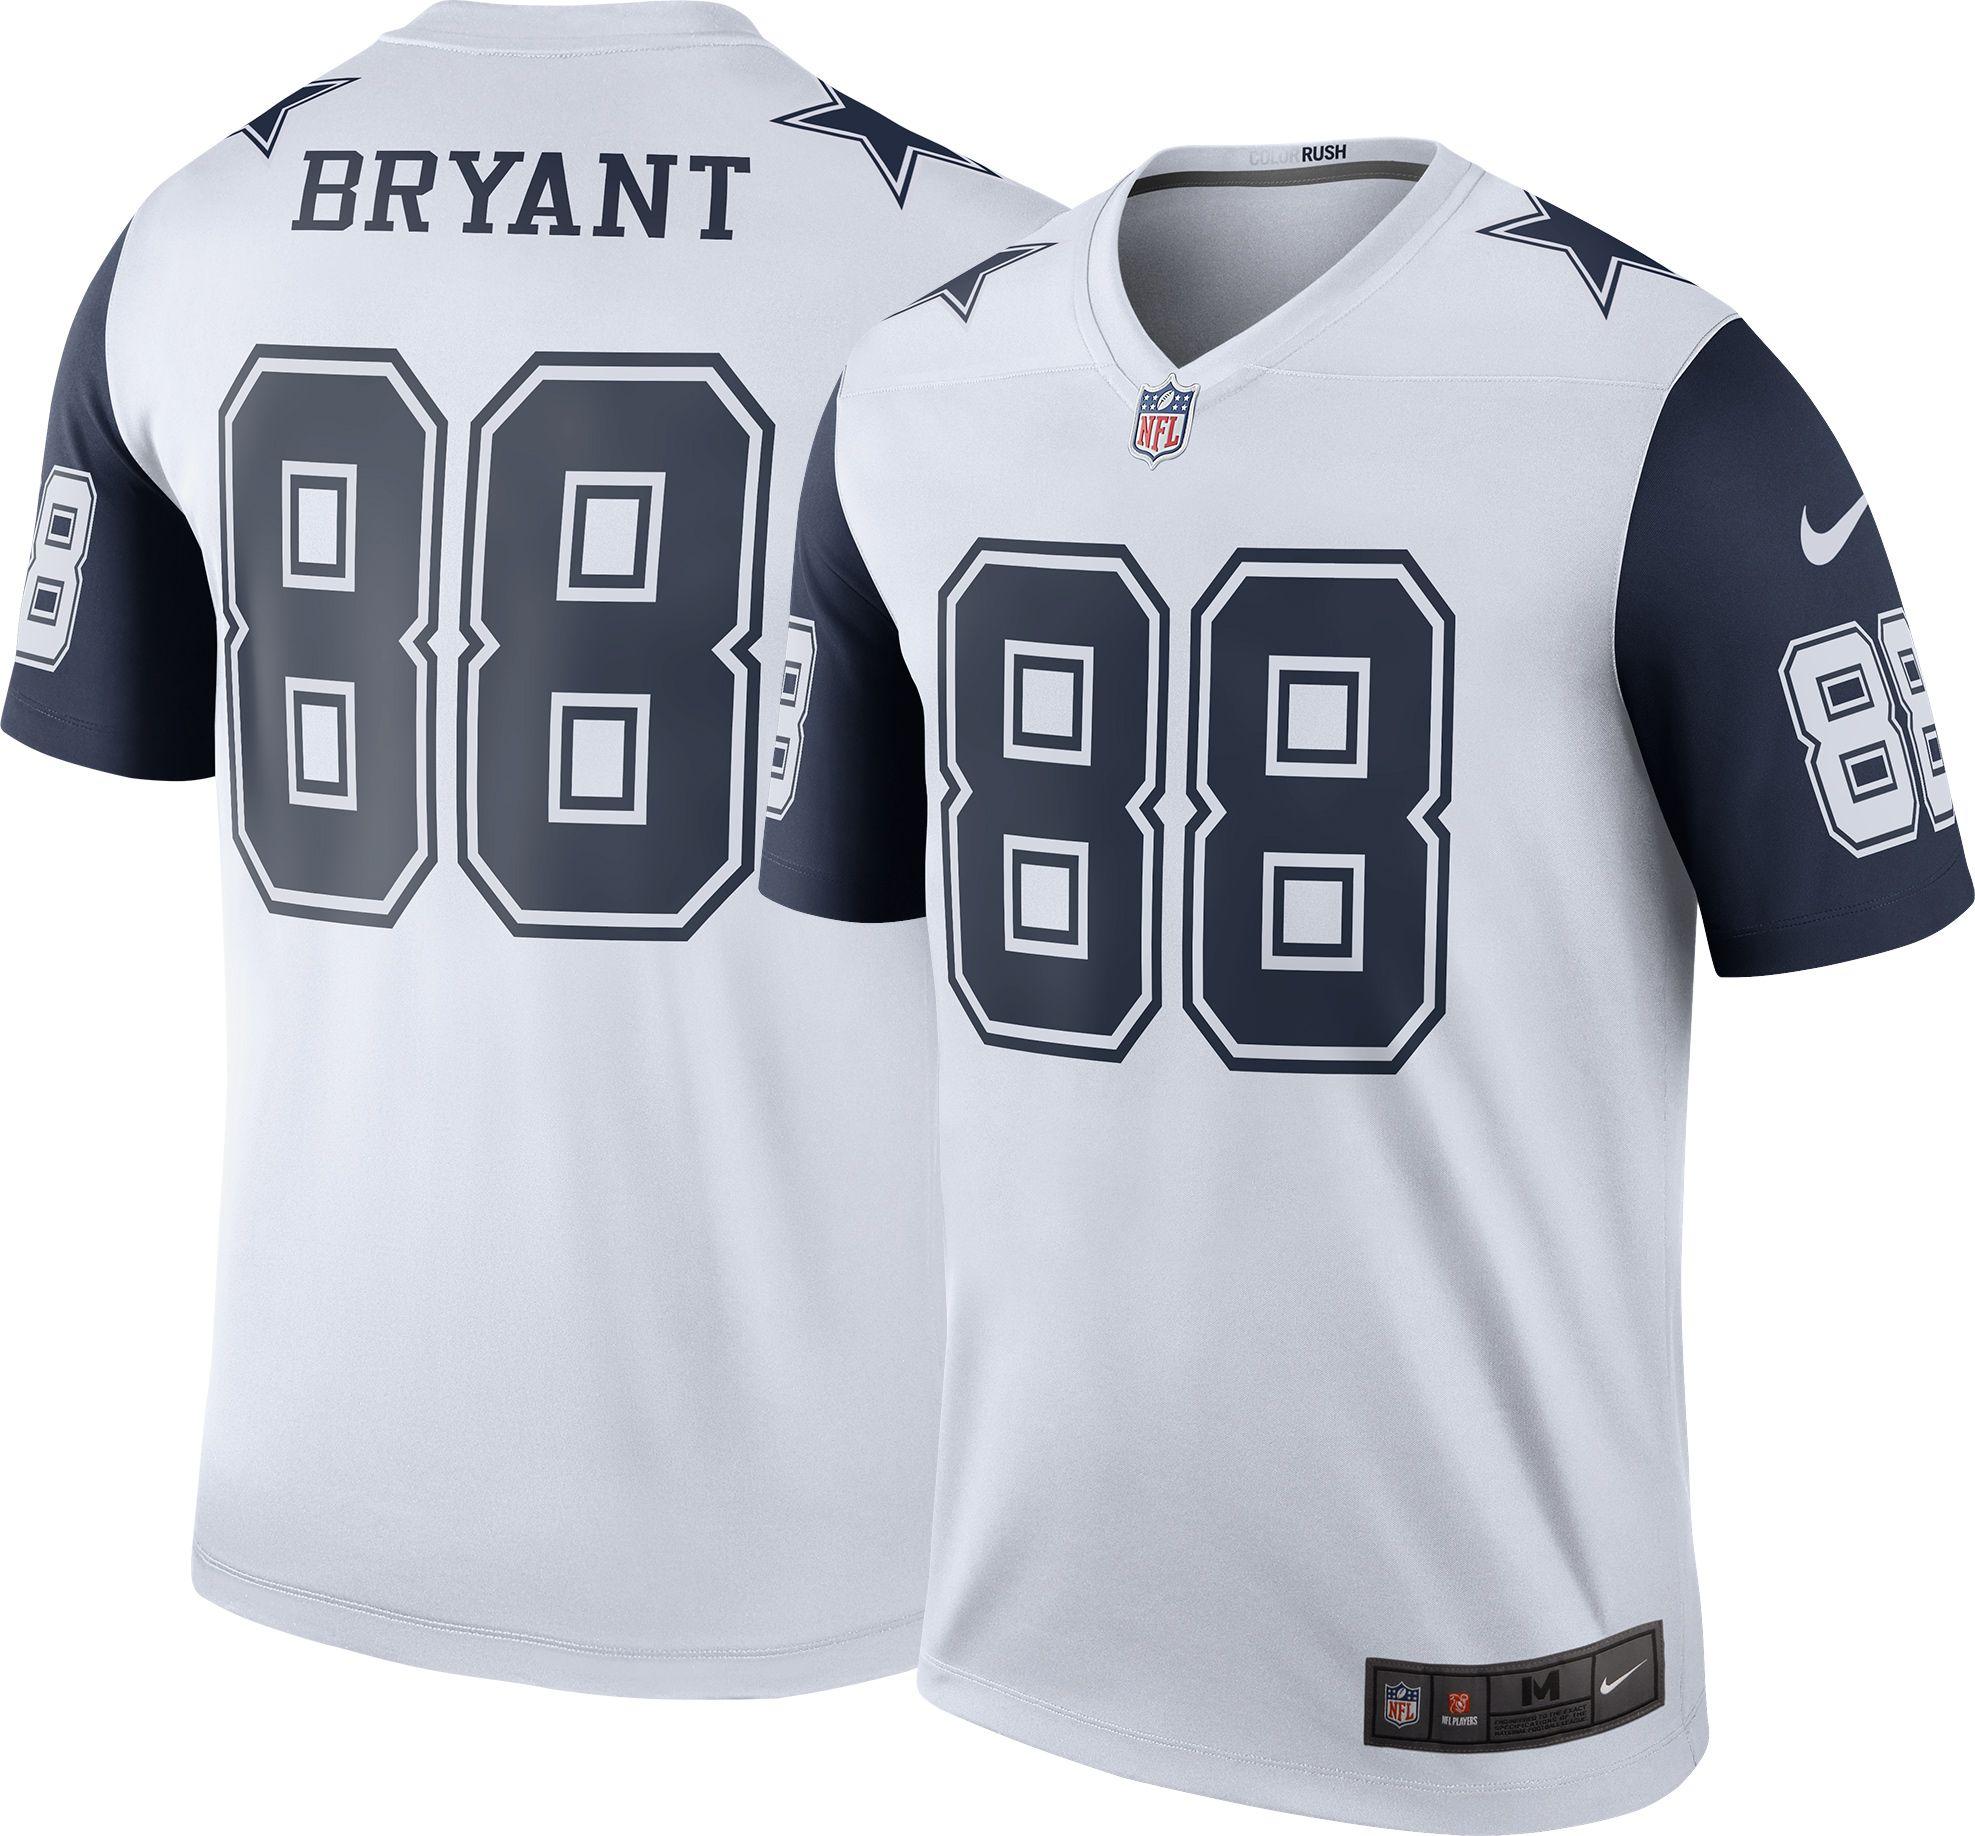 Nike Men's Color Rush Dallas Cowboys Dez Bryant #88 Legend Jersey   DICK'S  Sporting Goods